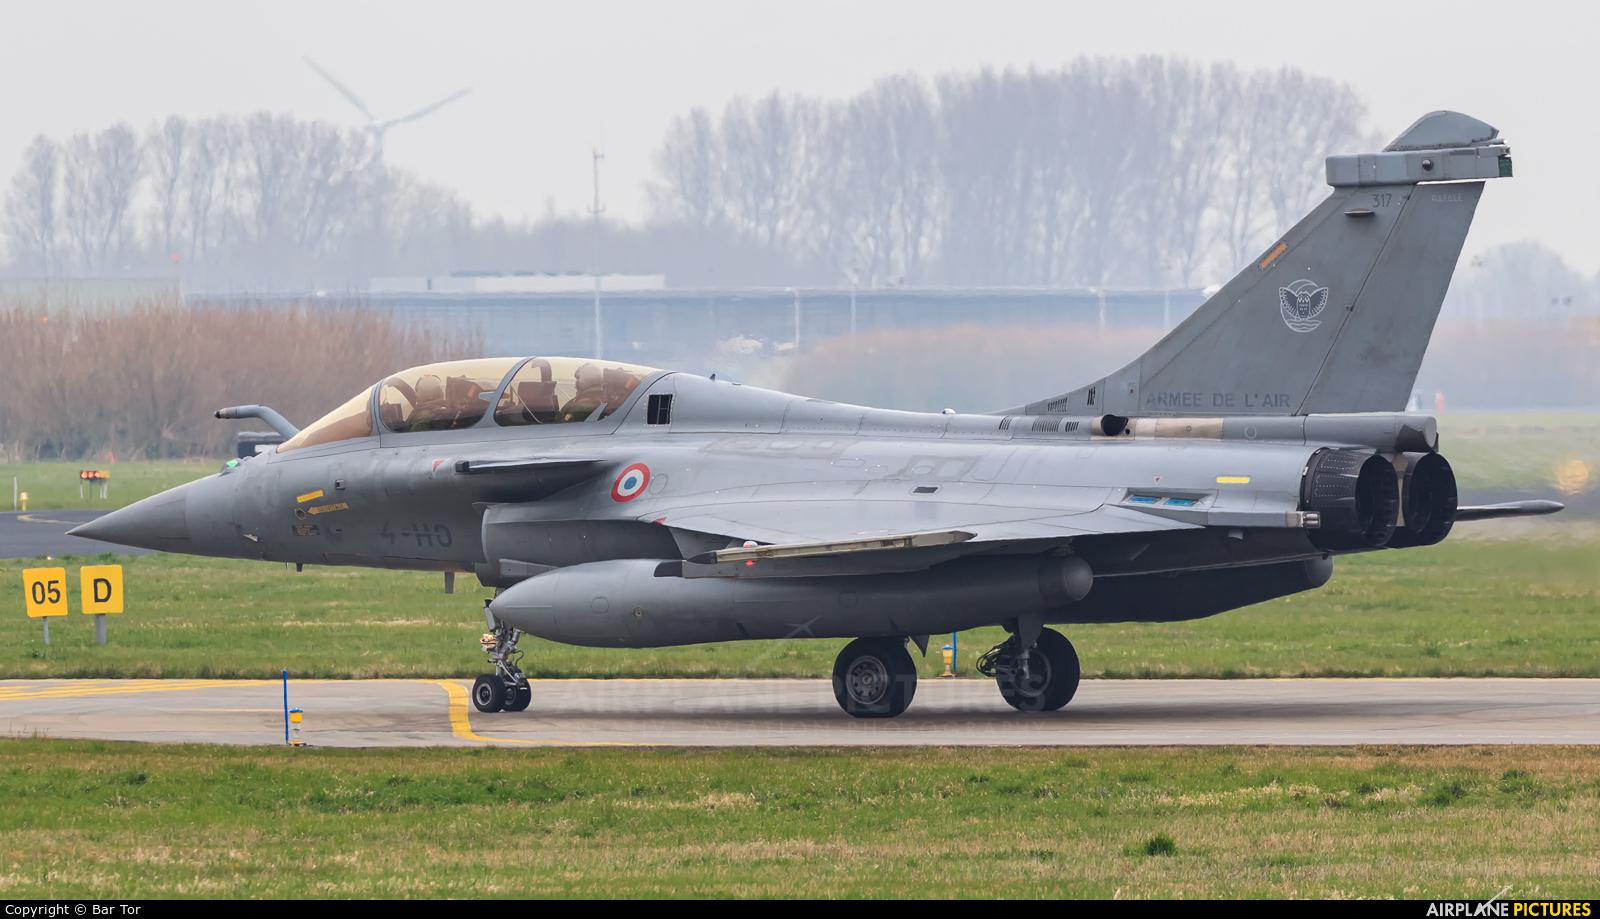 France - Air Force 317 aircraft at Leeuwarden